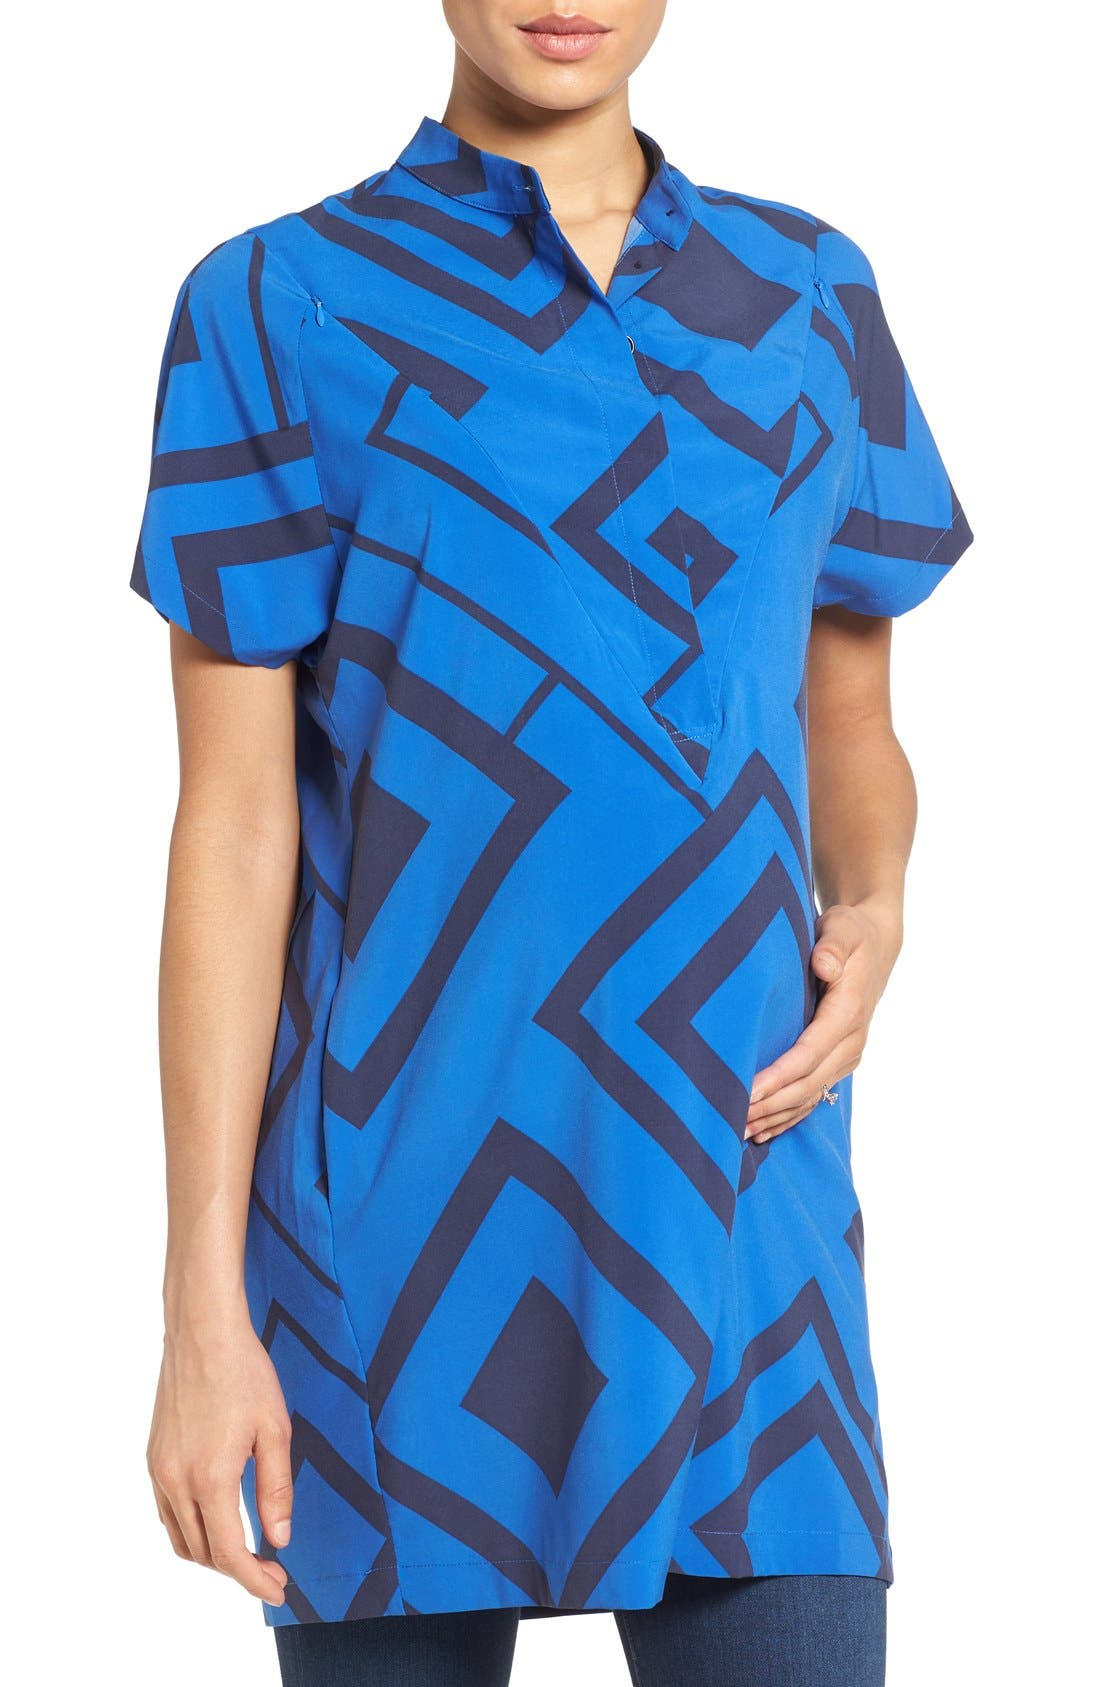 Alternate Image 1 Selected - Loyal Hana 'Erin' Print Maternity/Nursing Shirtdress